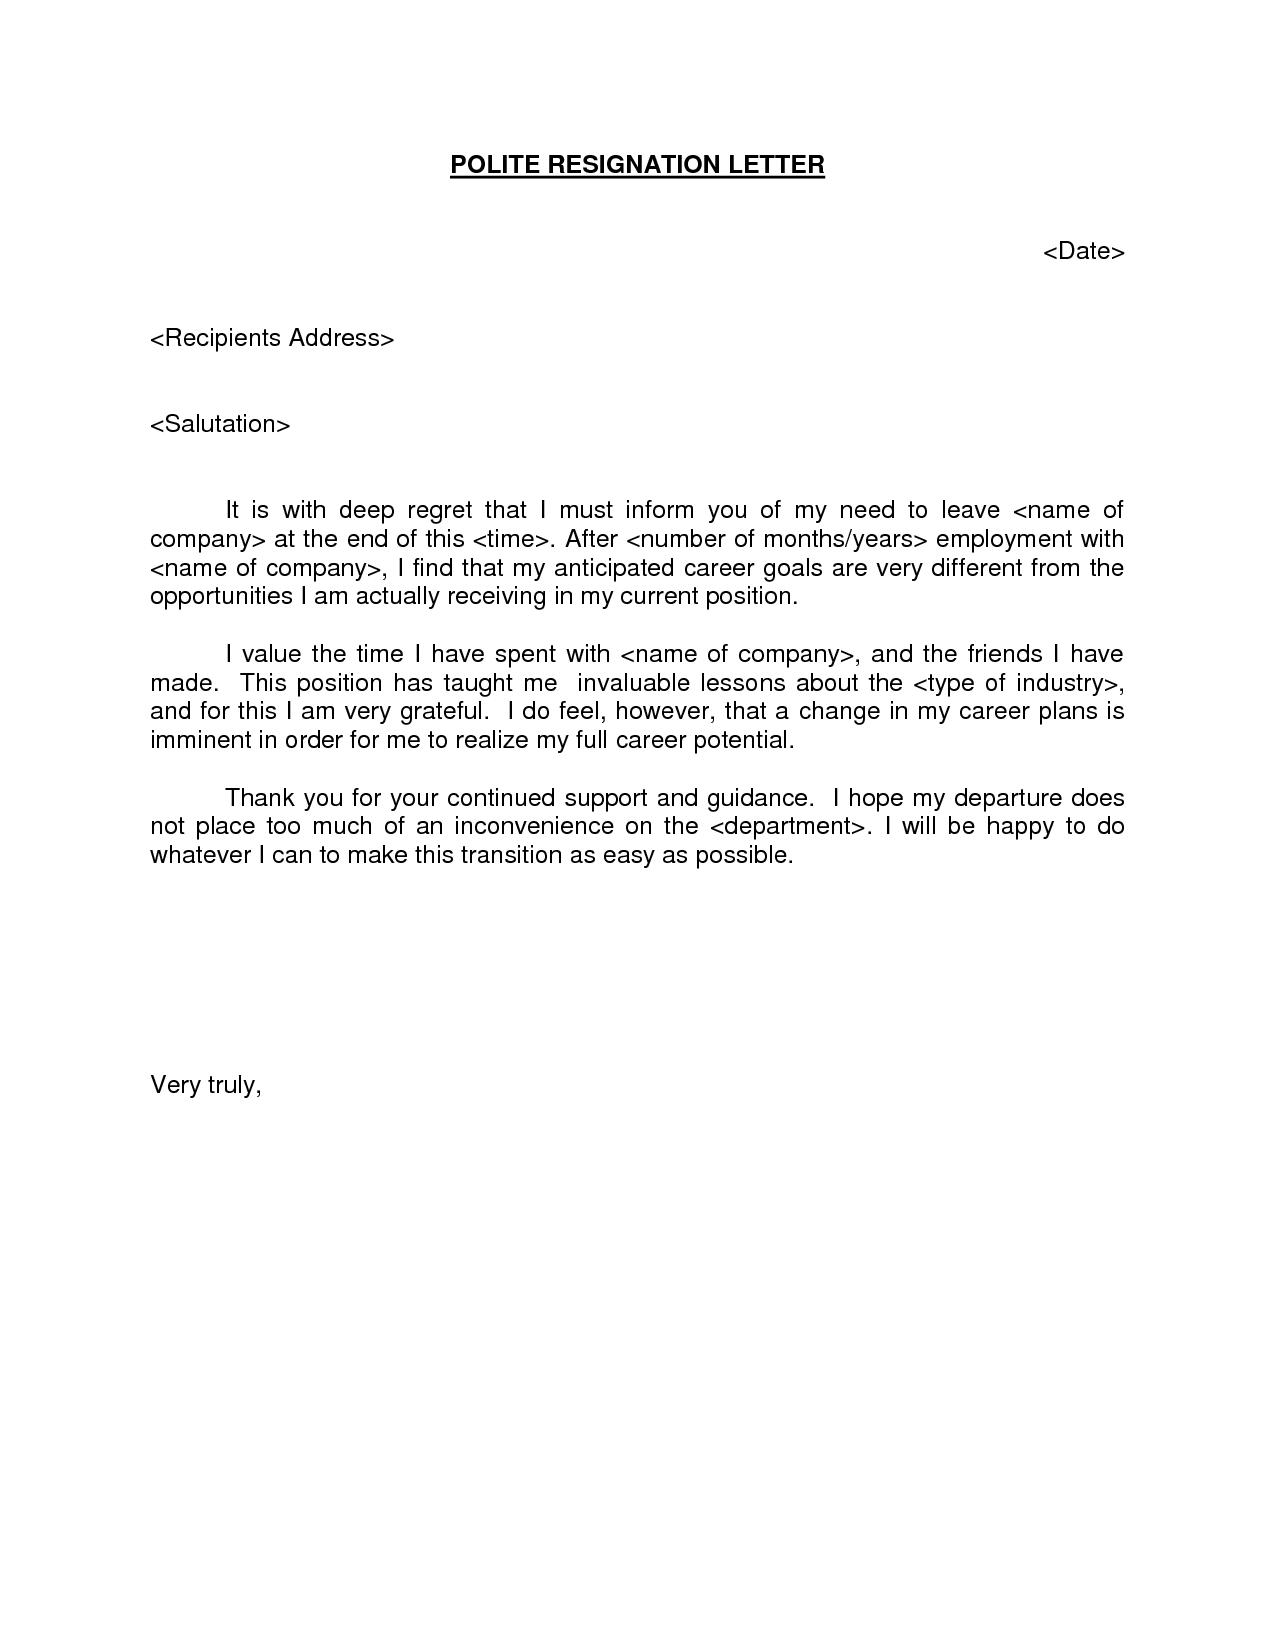 Professional Reference Letter Template - Polite Resignation Letter Bestdealformoneywriting A Letter